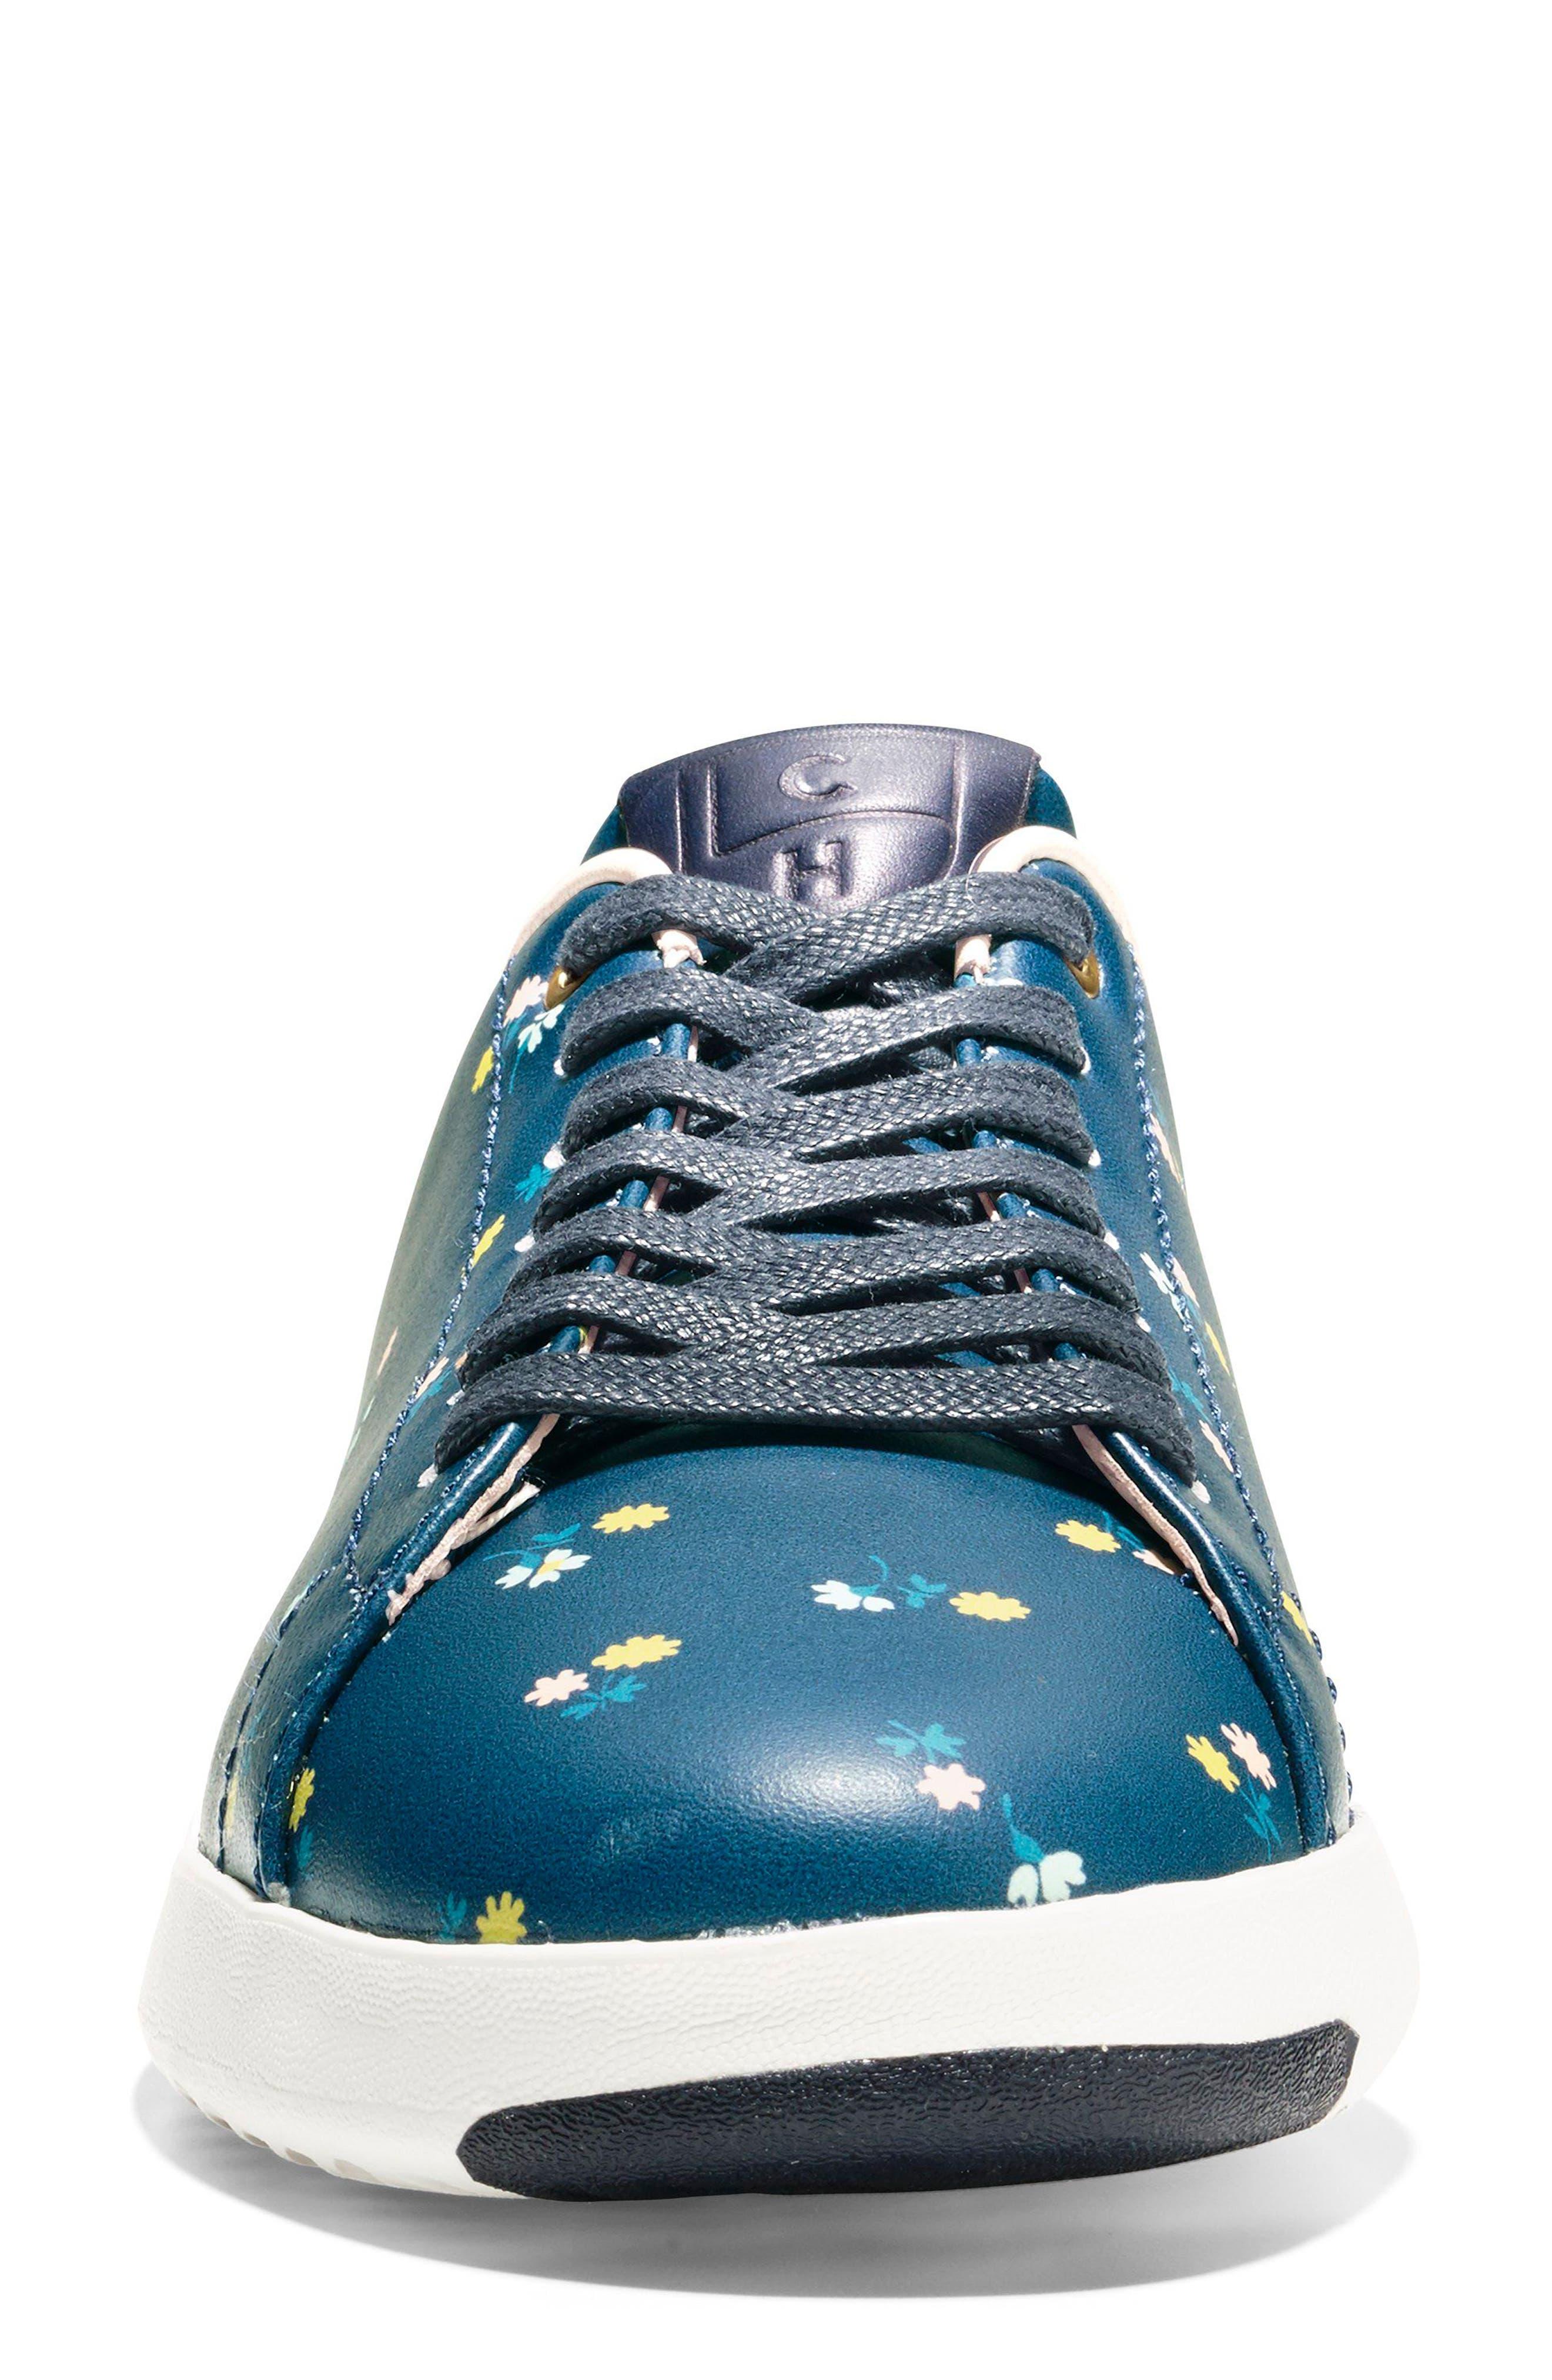 GrandPro Tennis Shoe,                             Alternate thumbnail 4, color,                             NAVY FLORAL LEATHER